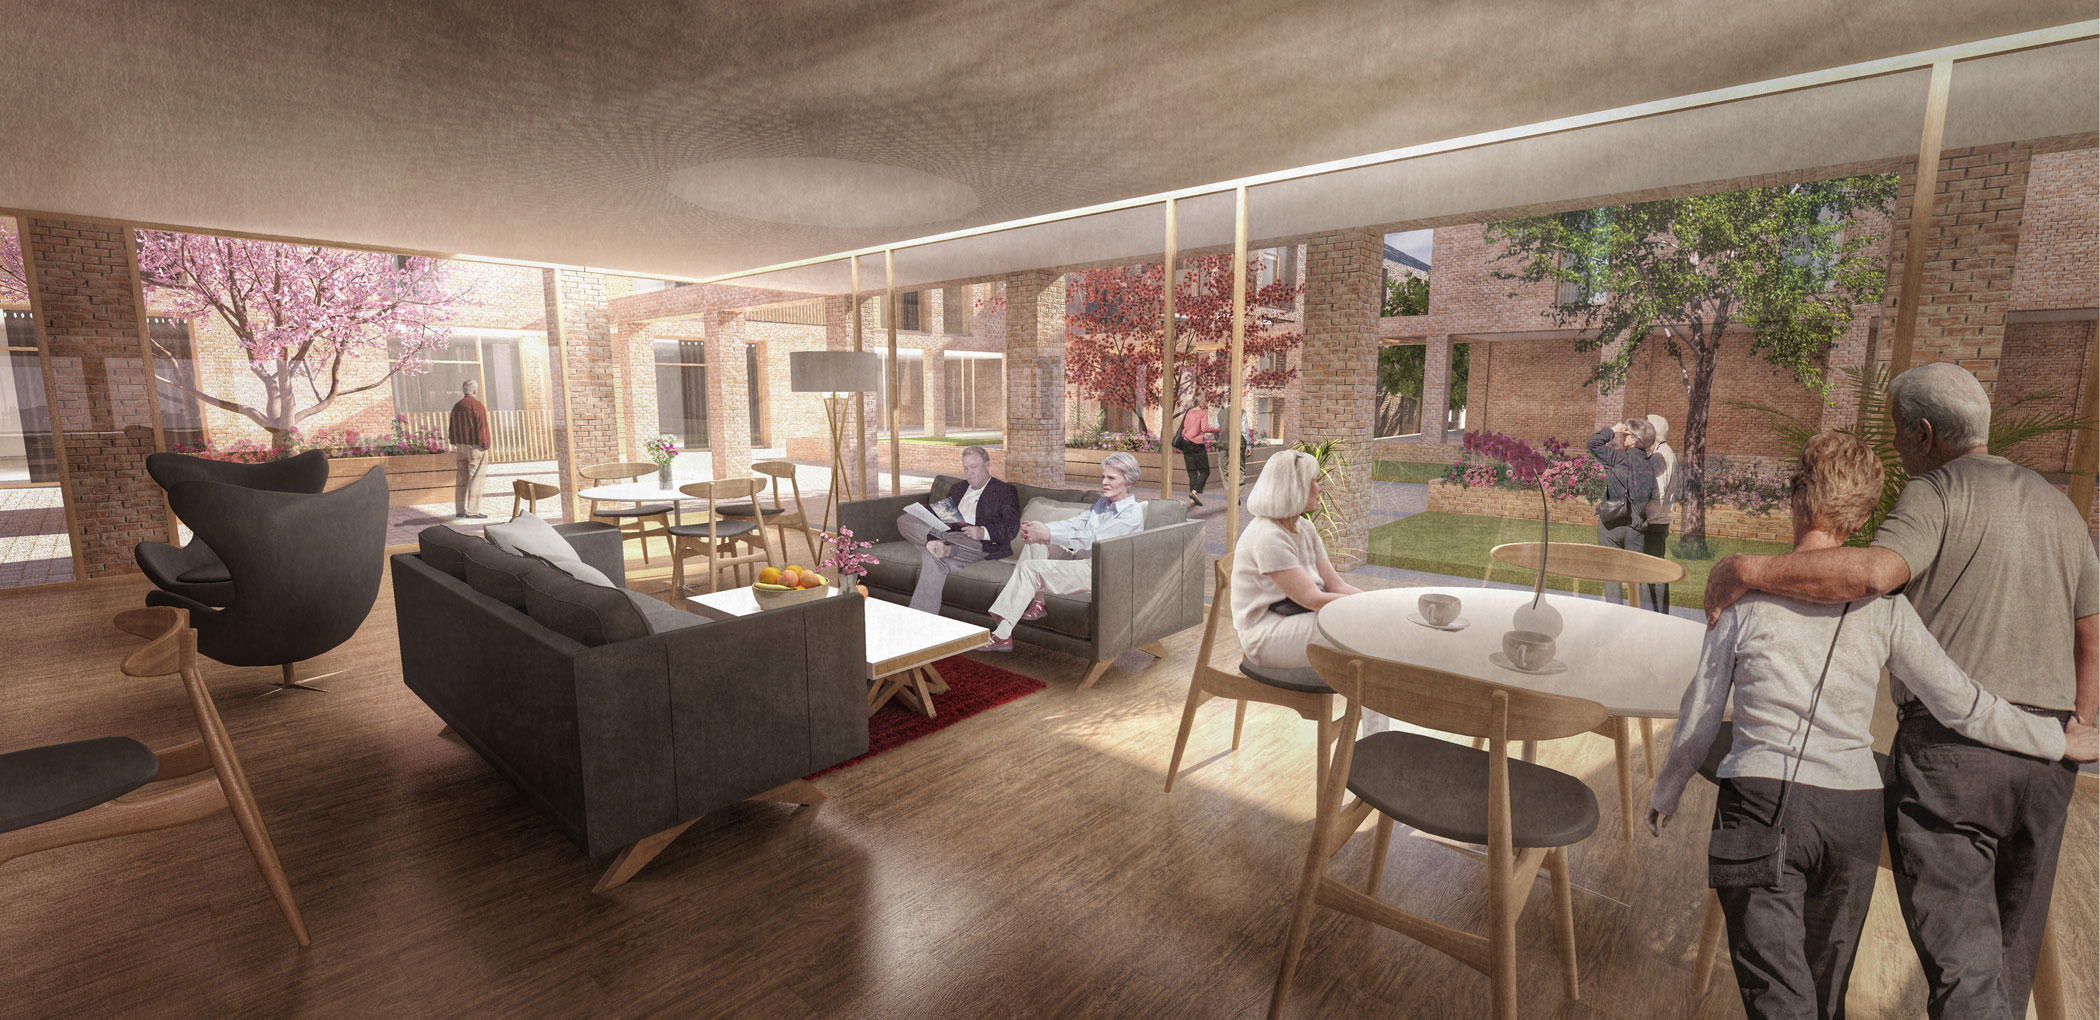 Communal Living Space